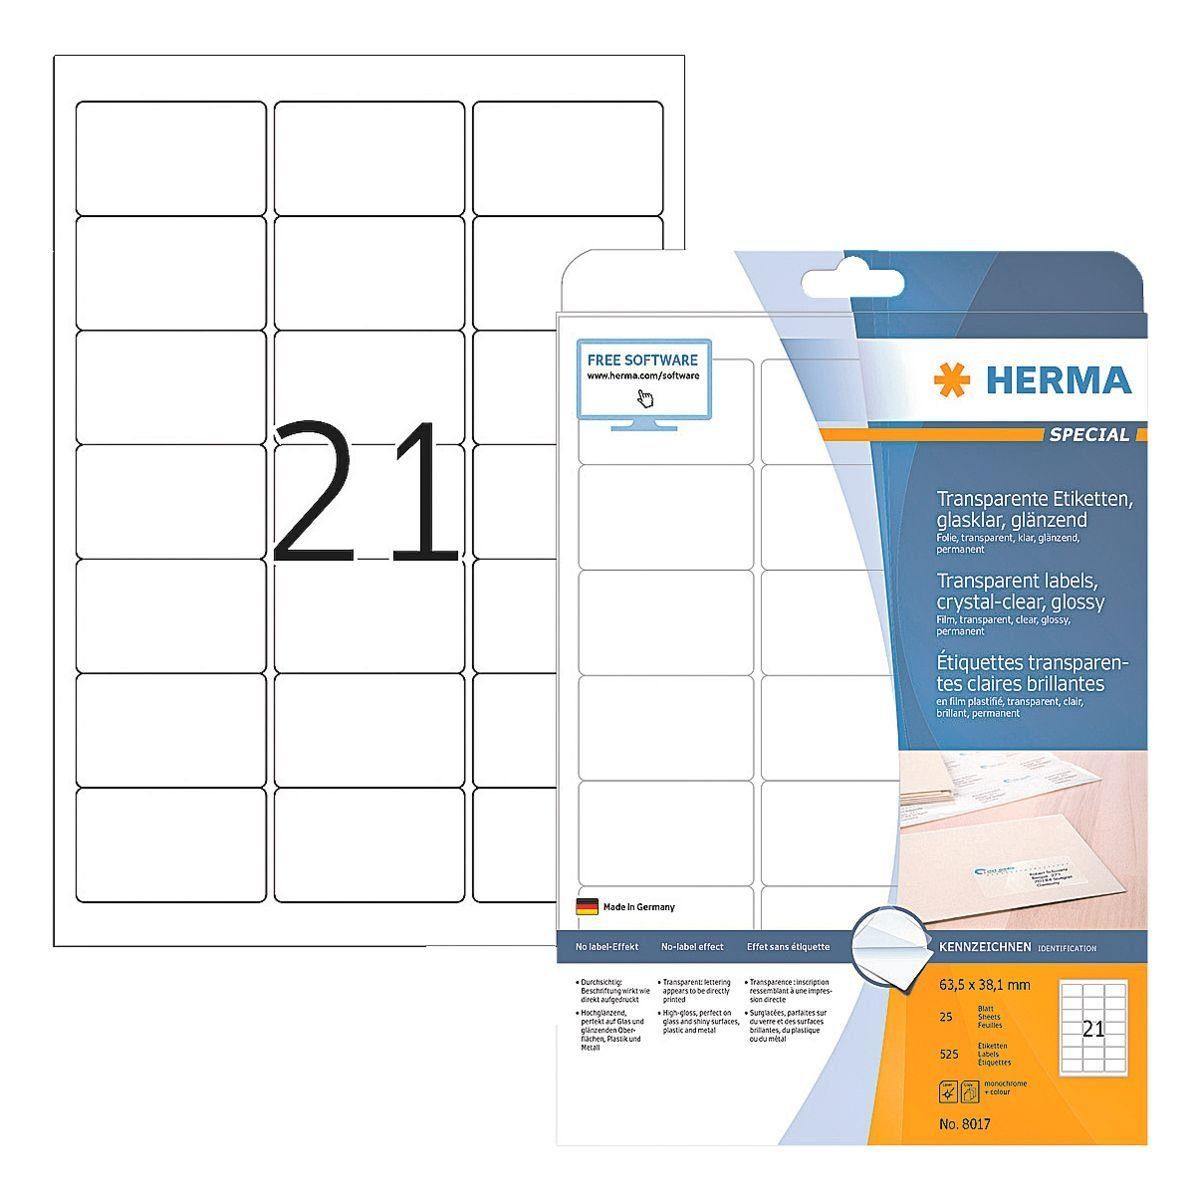 HERMA Transparente Folien-Etiketten 525 Stück »Special«